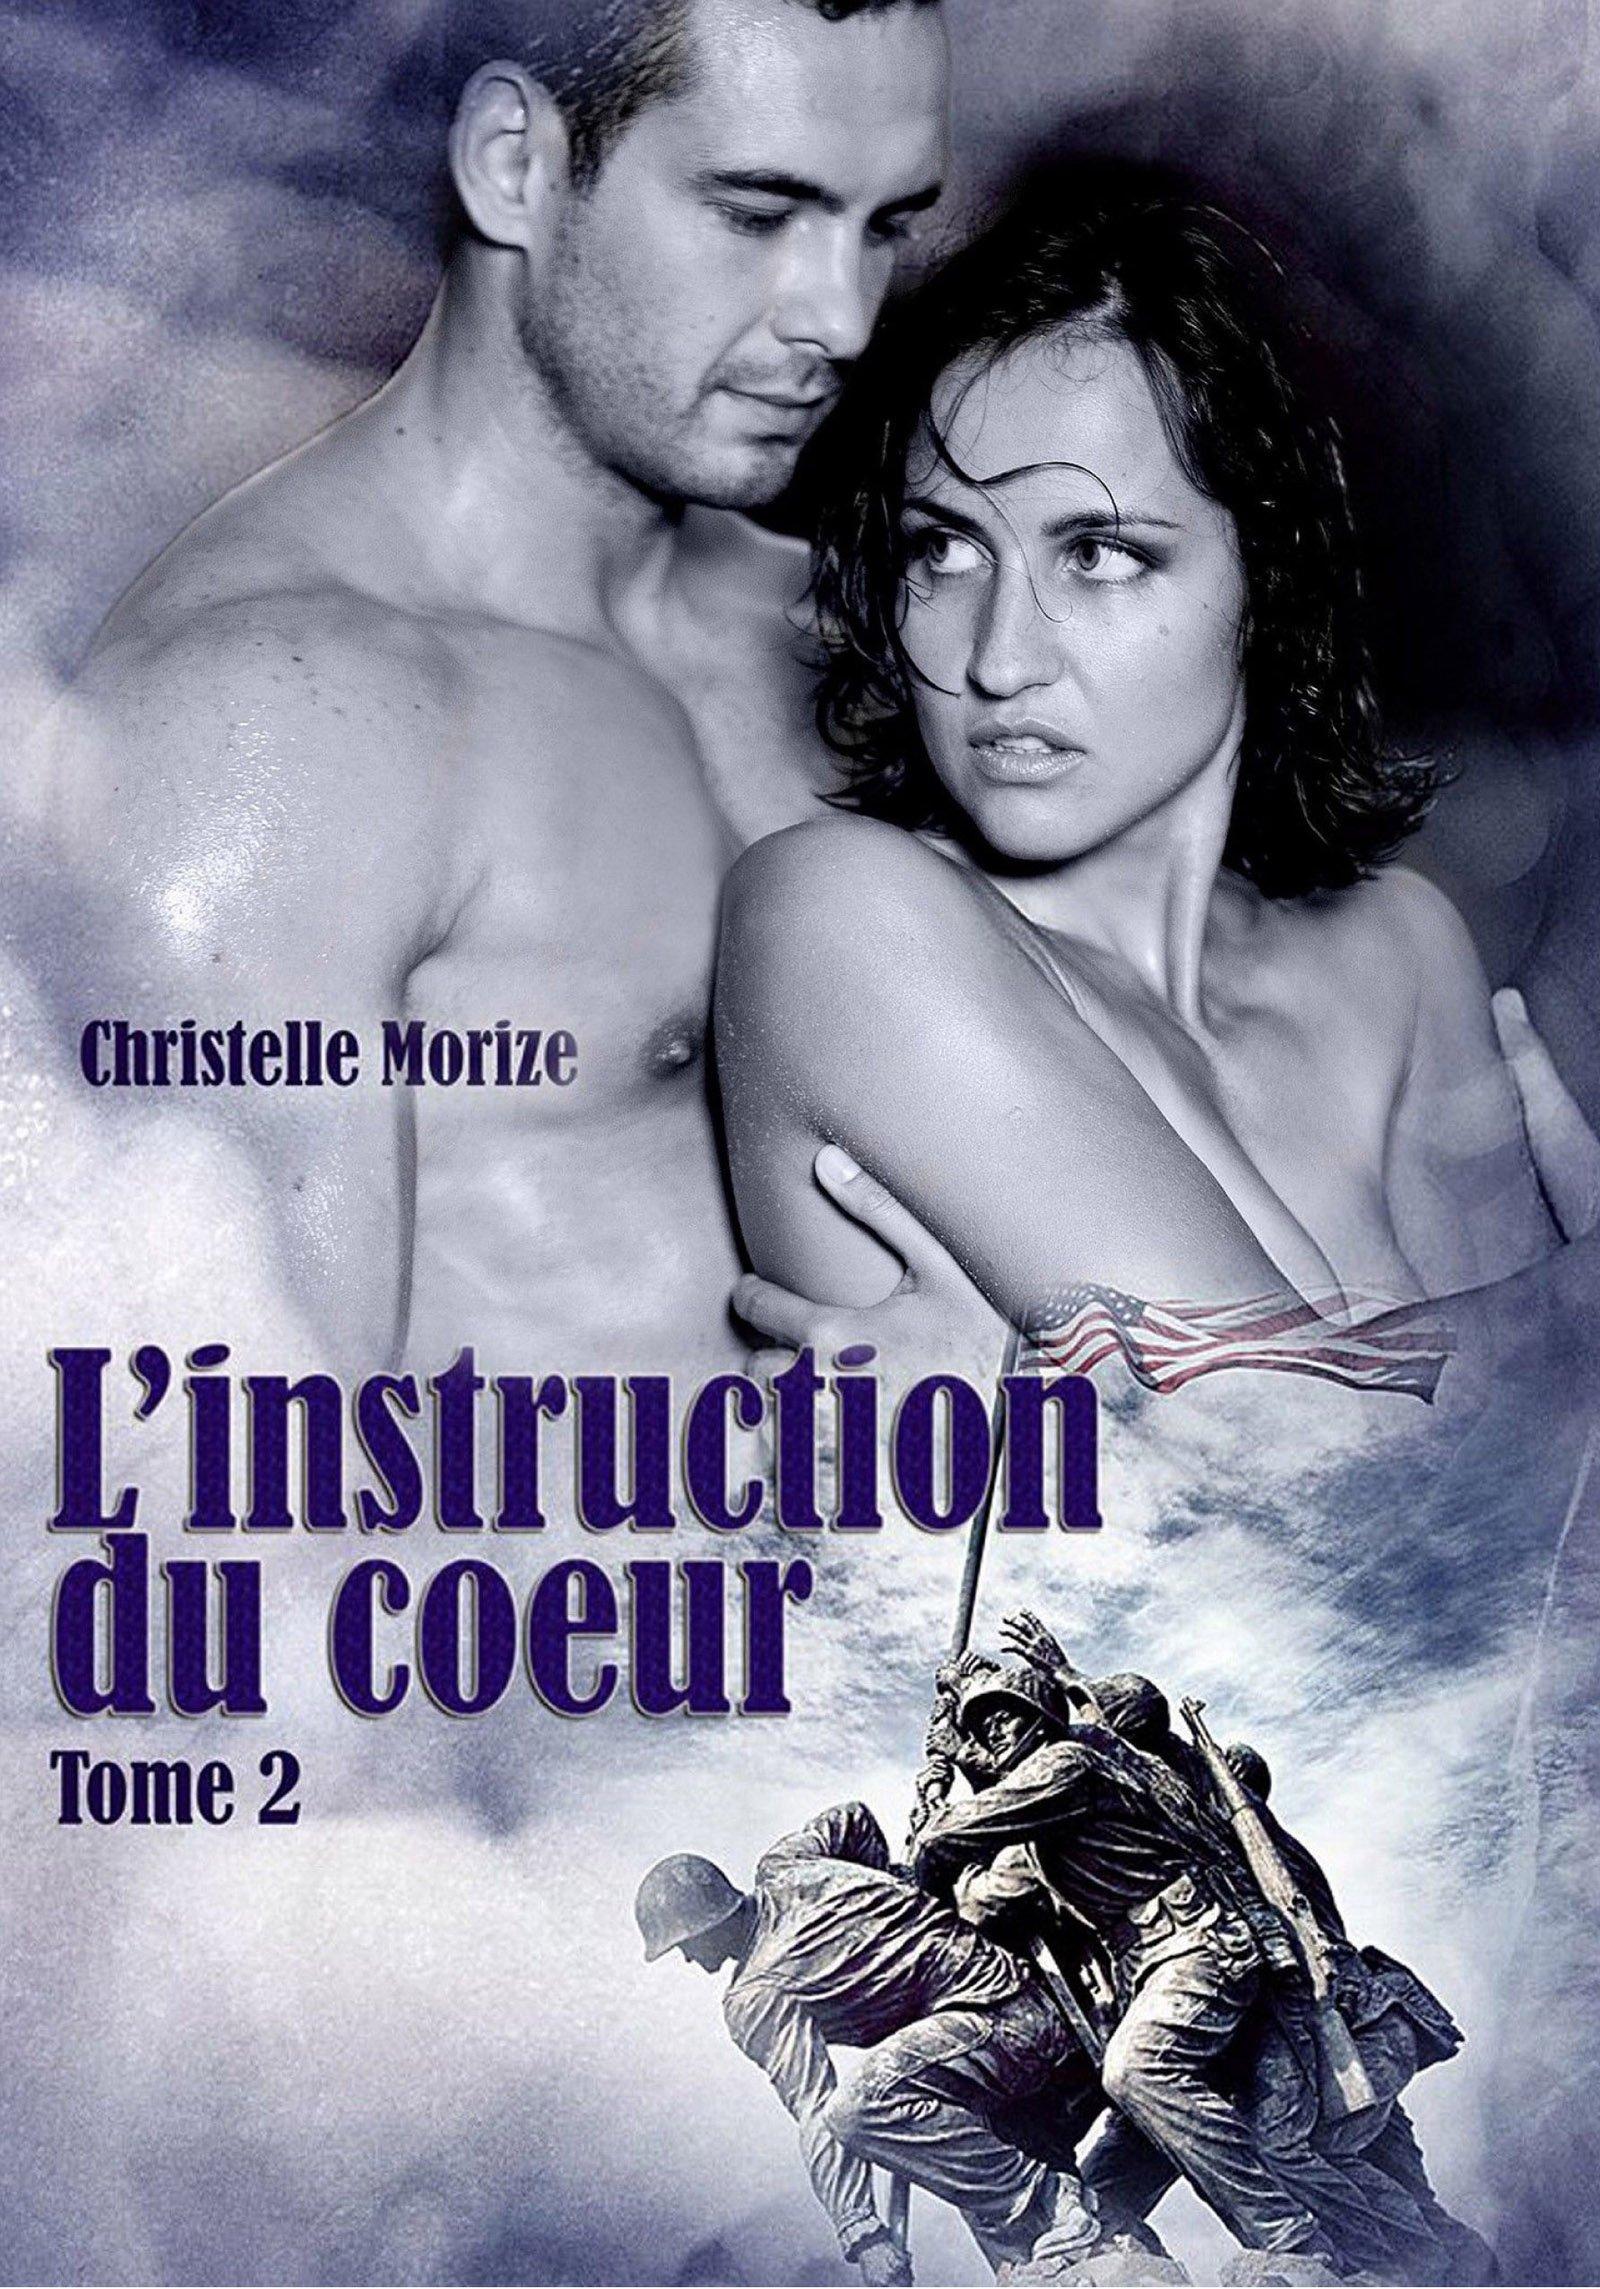 L'instruction du coeur, tome 2 por Christelle Morize